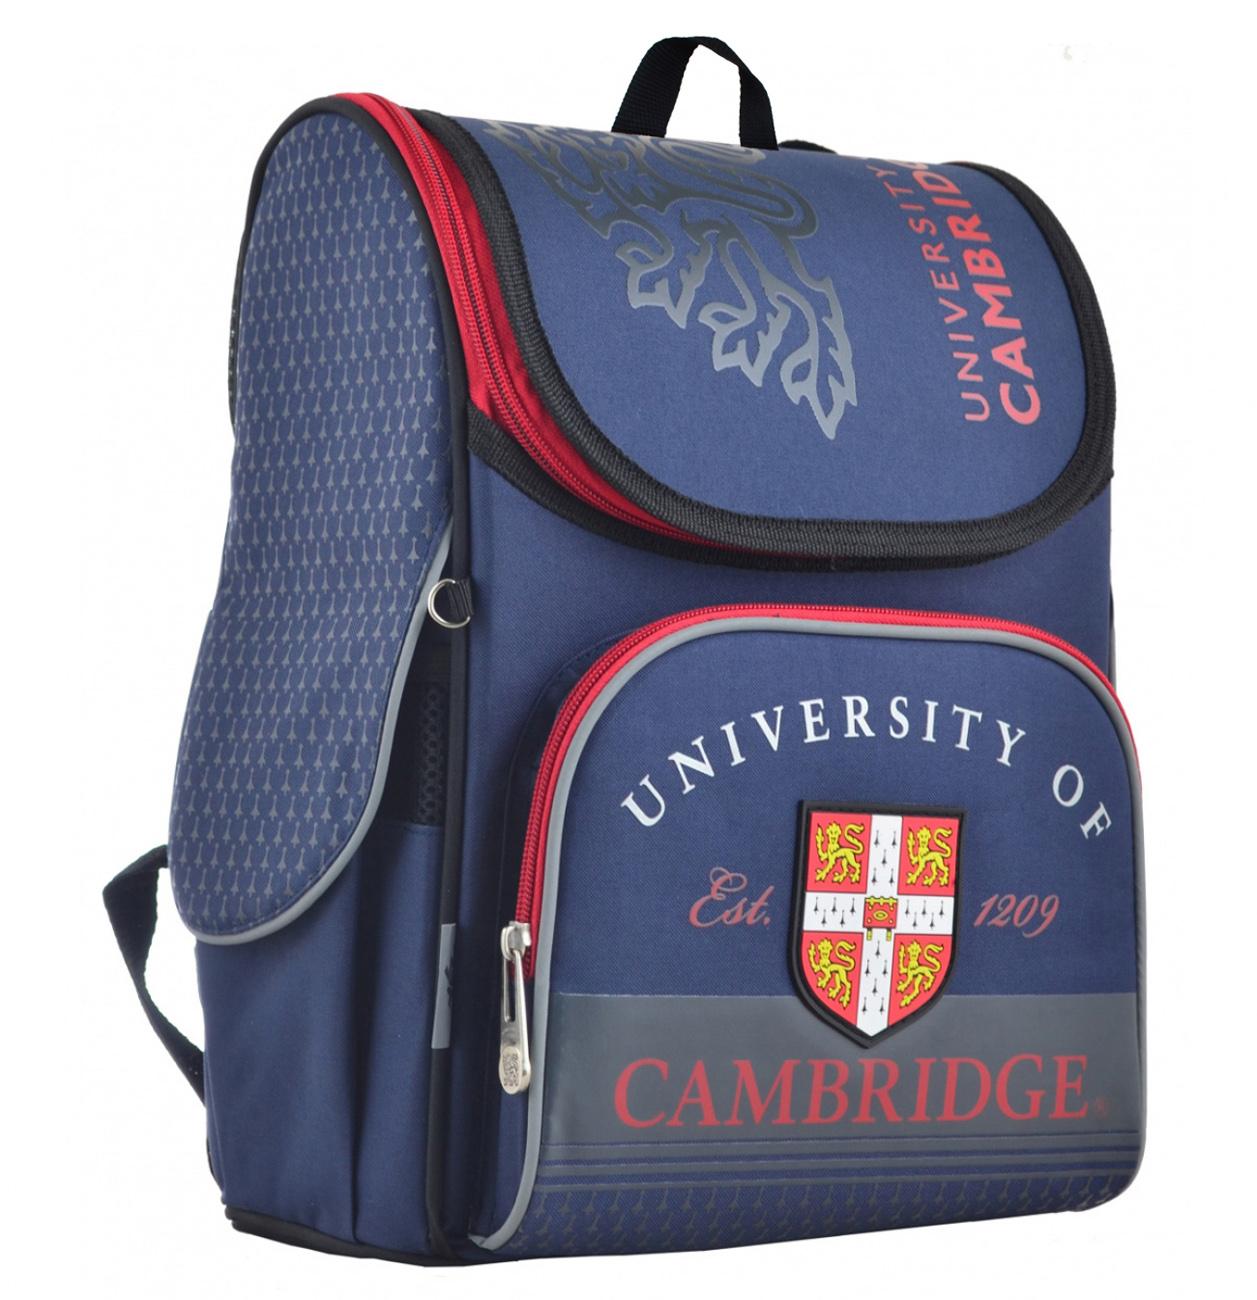 Рюкзак каркасный H-11 Cambridge, 33.5*26*13.5